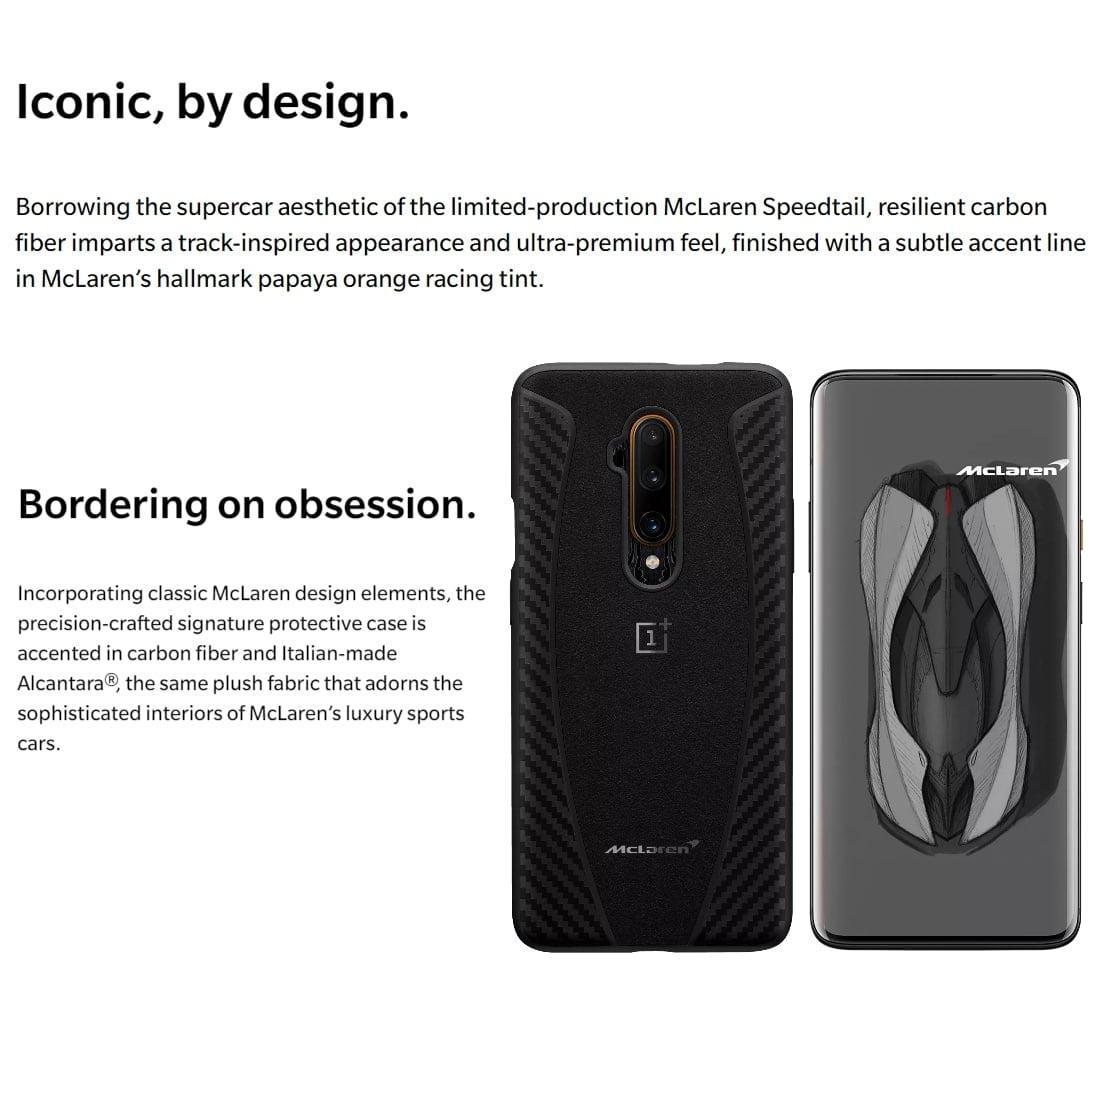 OnePlus 7T Pro McLaren Limited Edition Smartphone